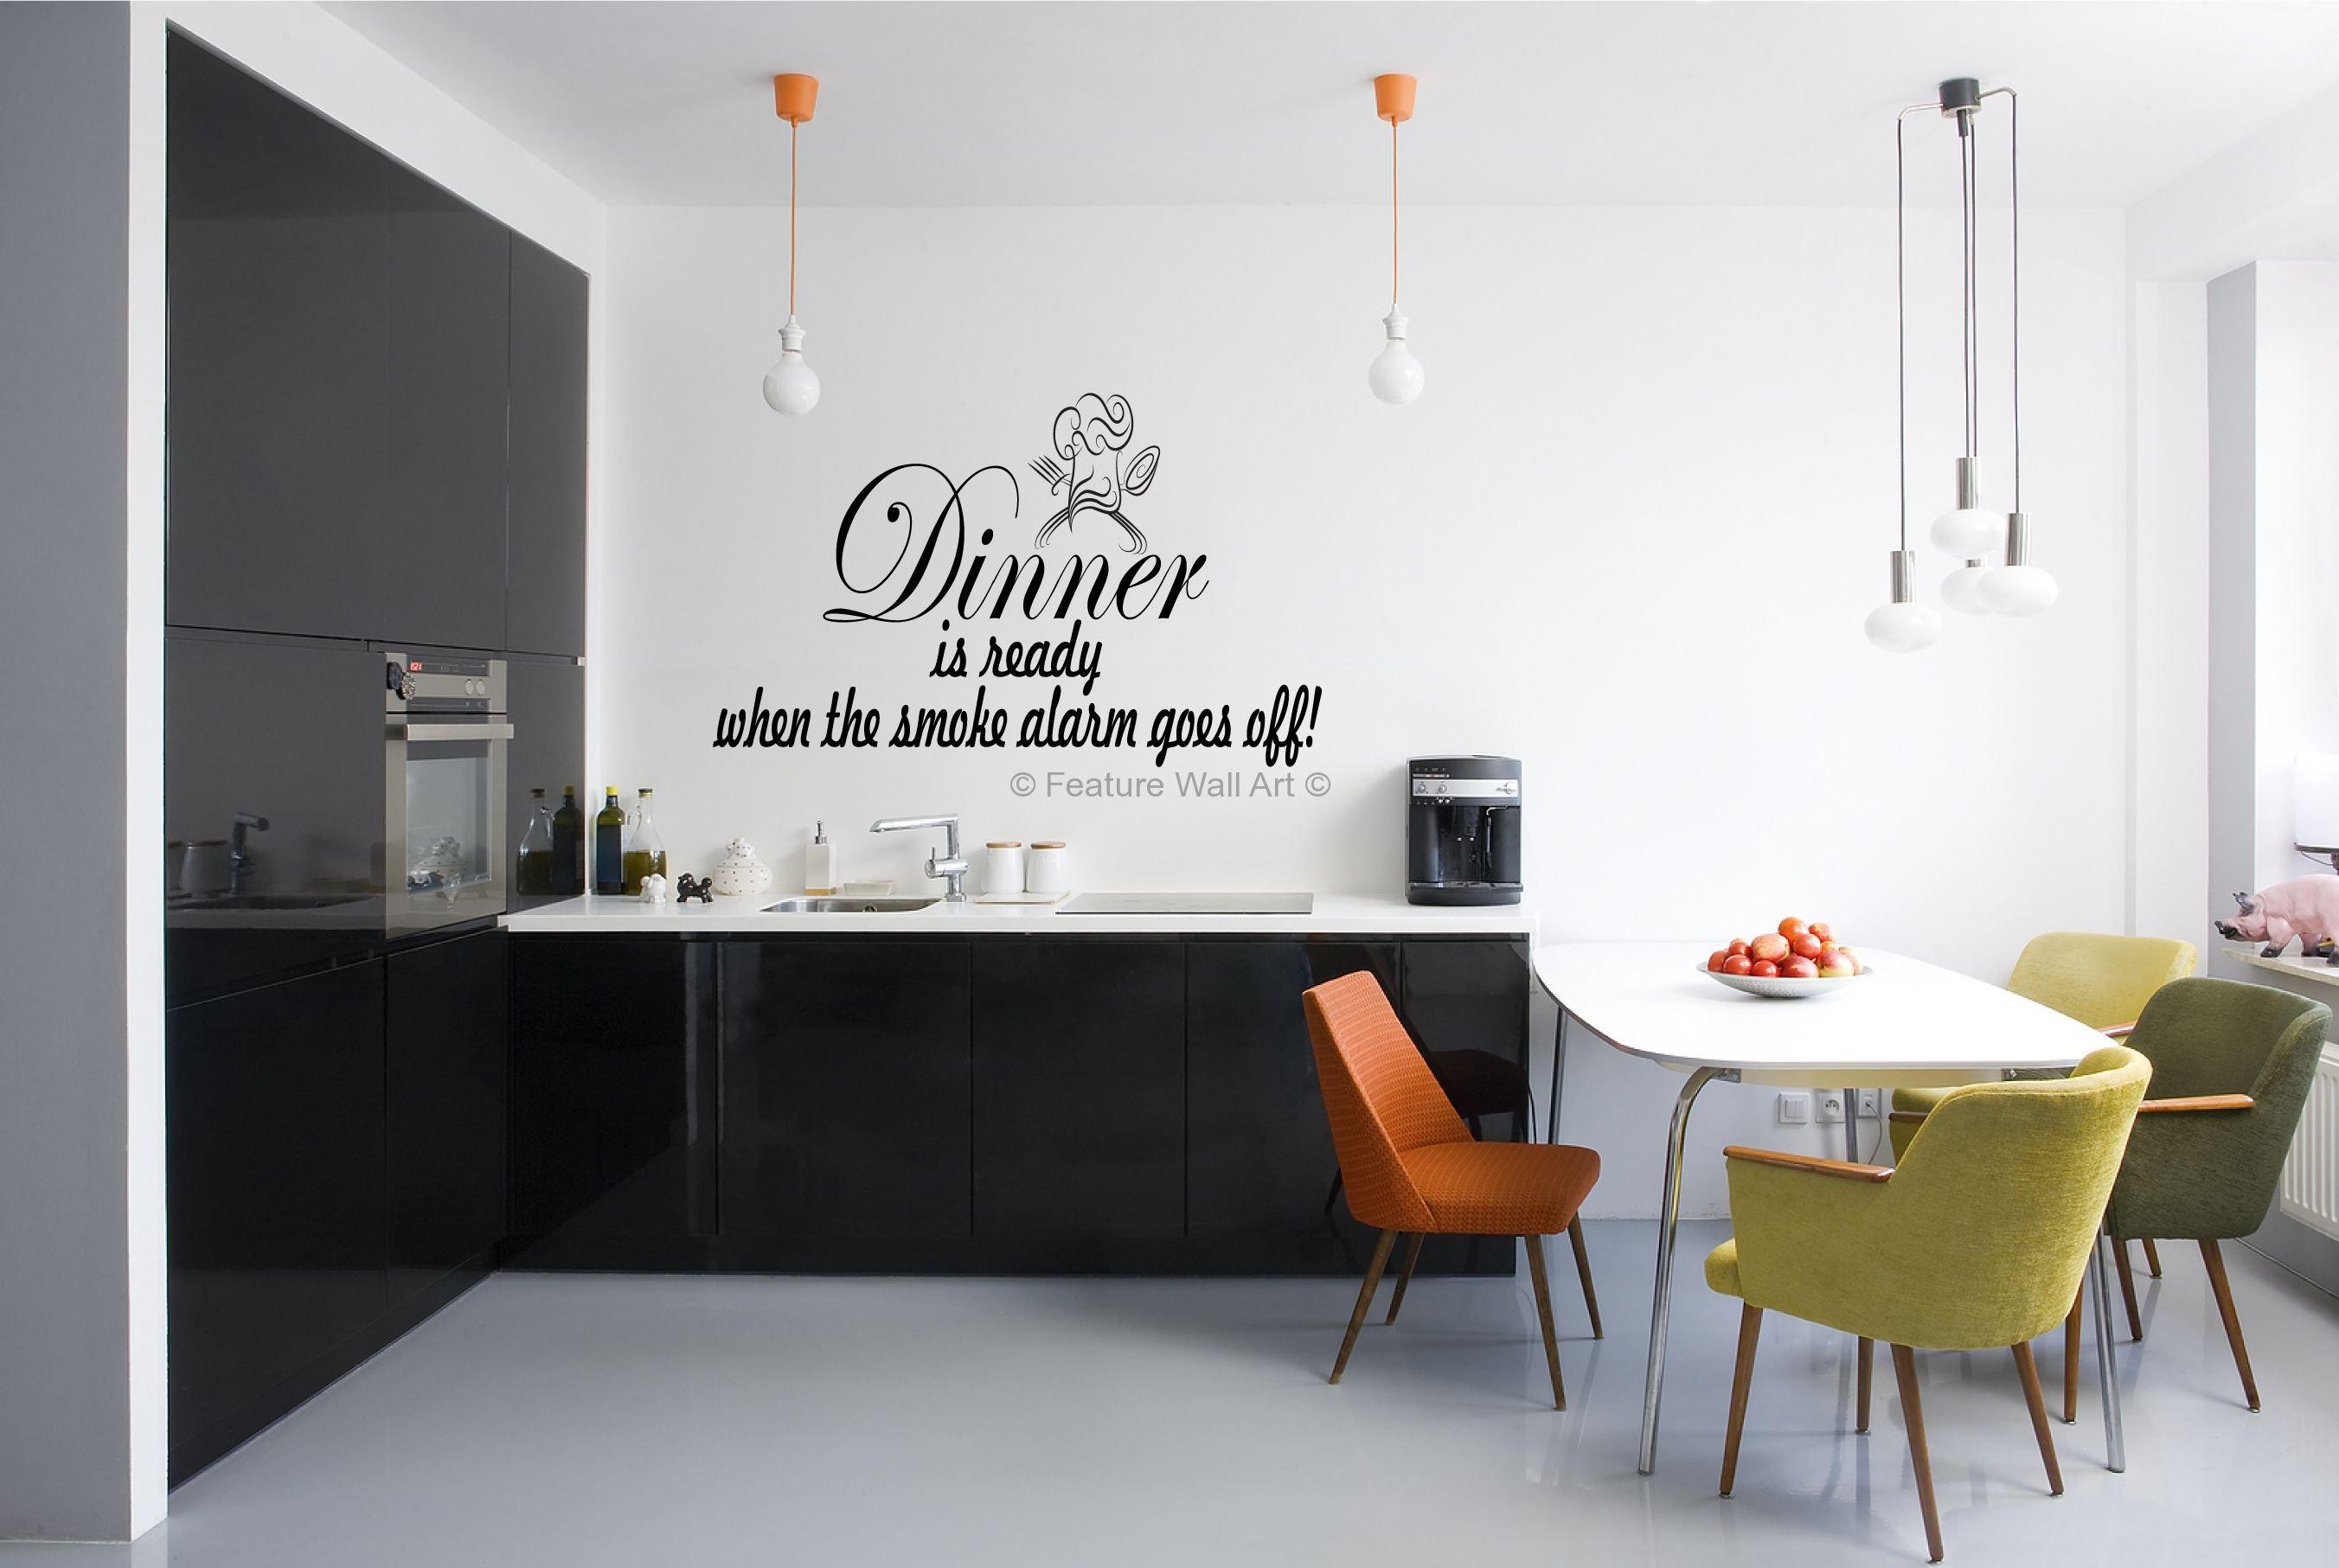 Quotes about dinner quotesgram - Muurdecoratie badkamer ...